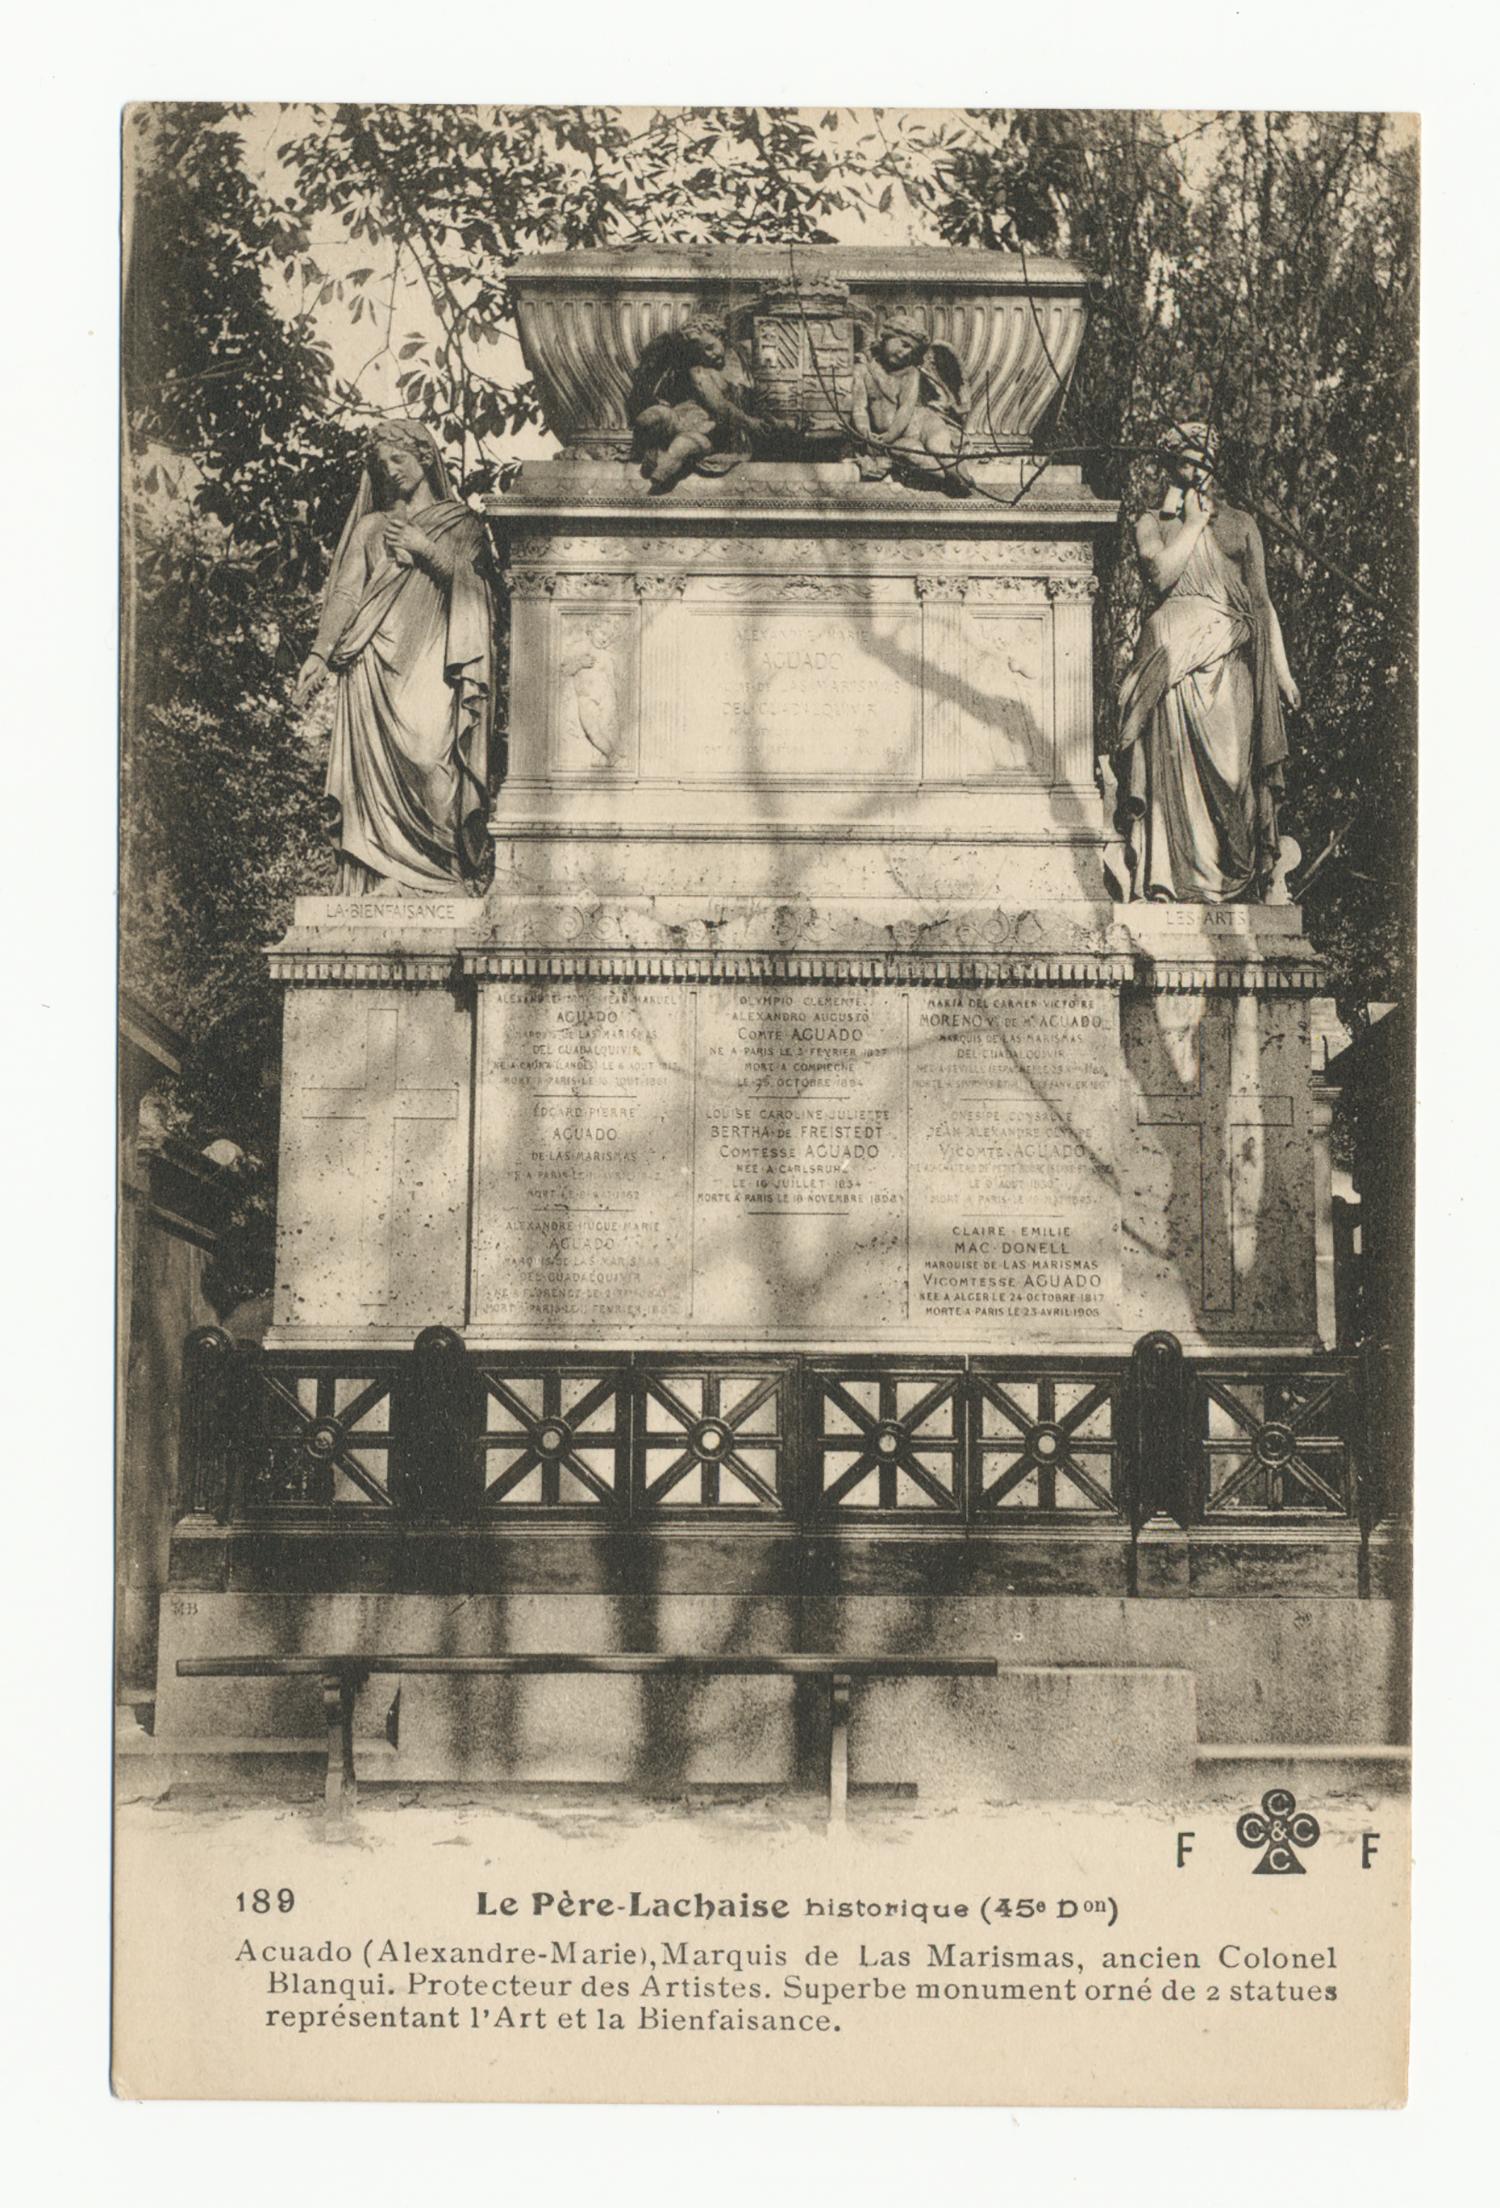 c. 1900